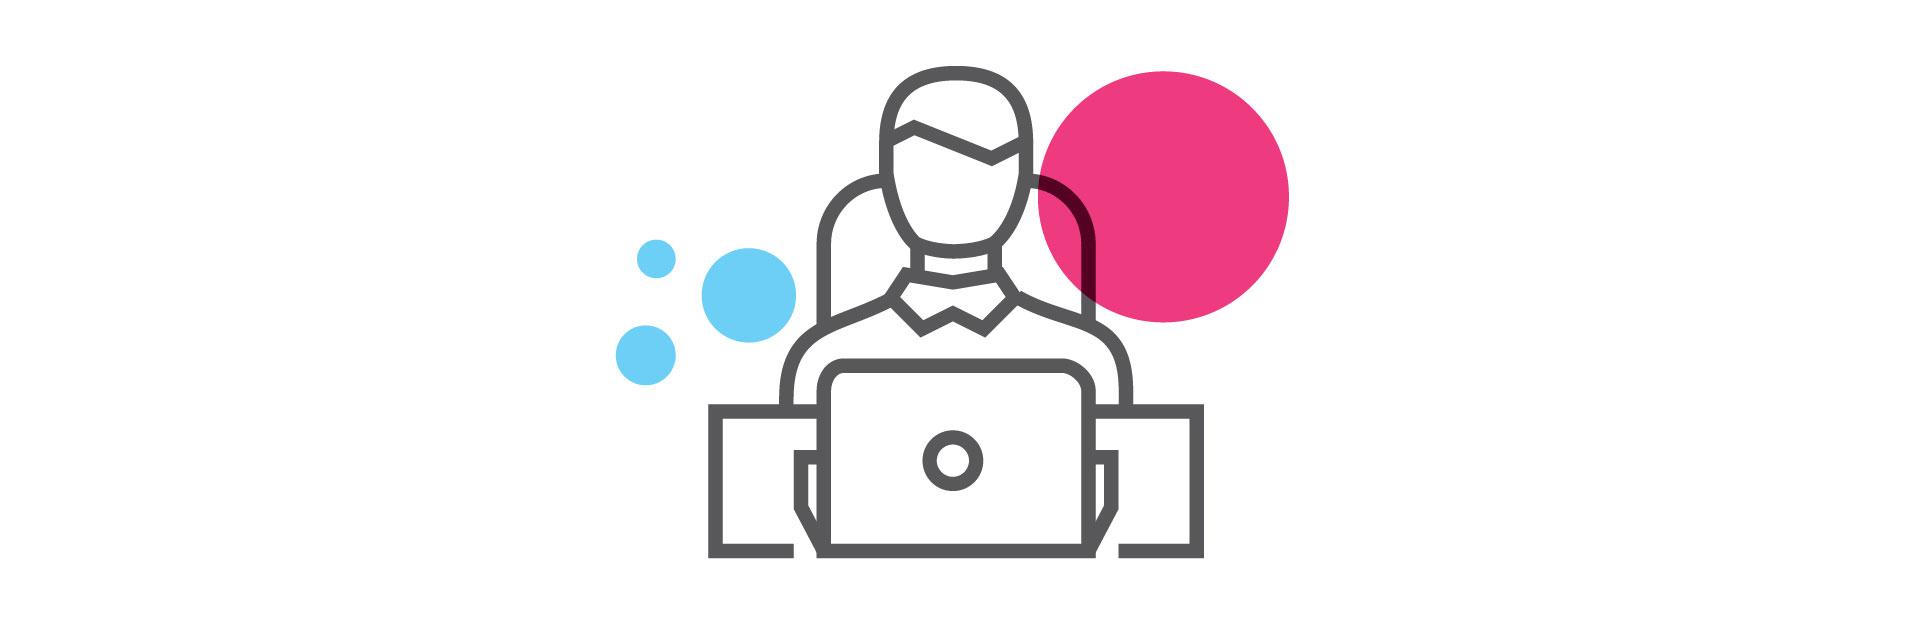 surabaya web design layanan pelanggan bisnis media sosial marketing